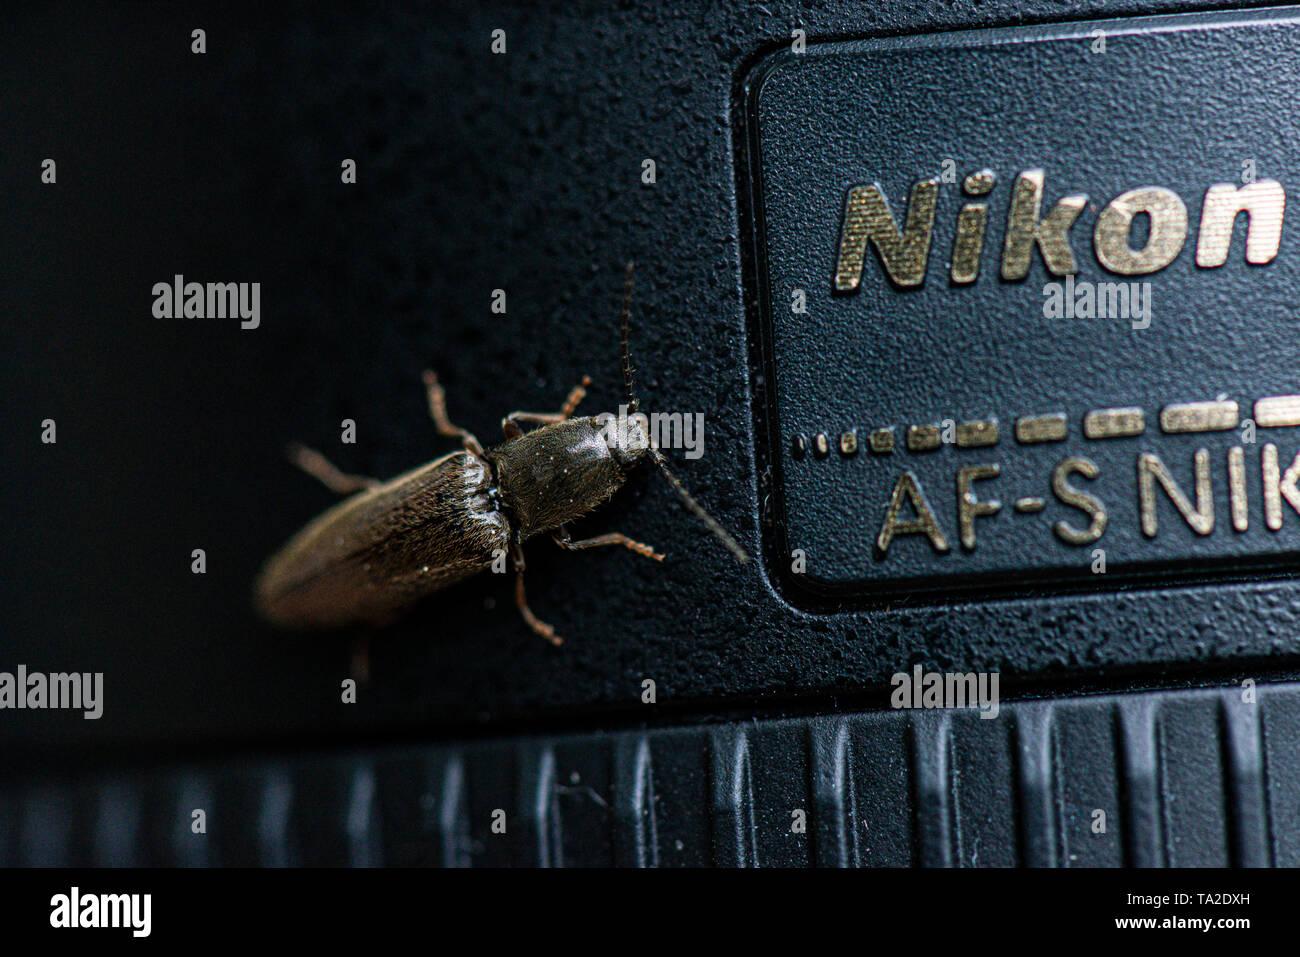 A click beetle on a Nikon camera lens - Stock Image